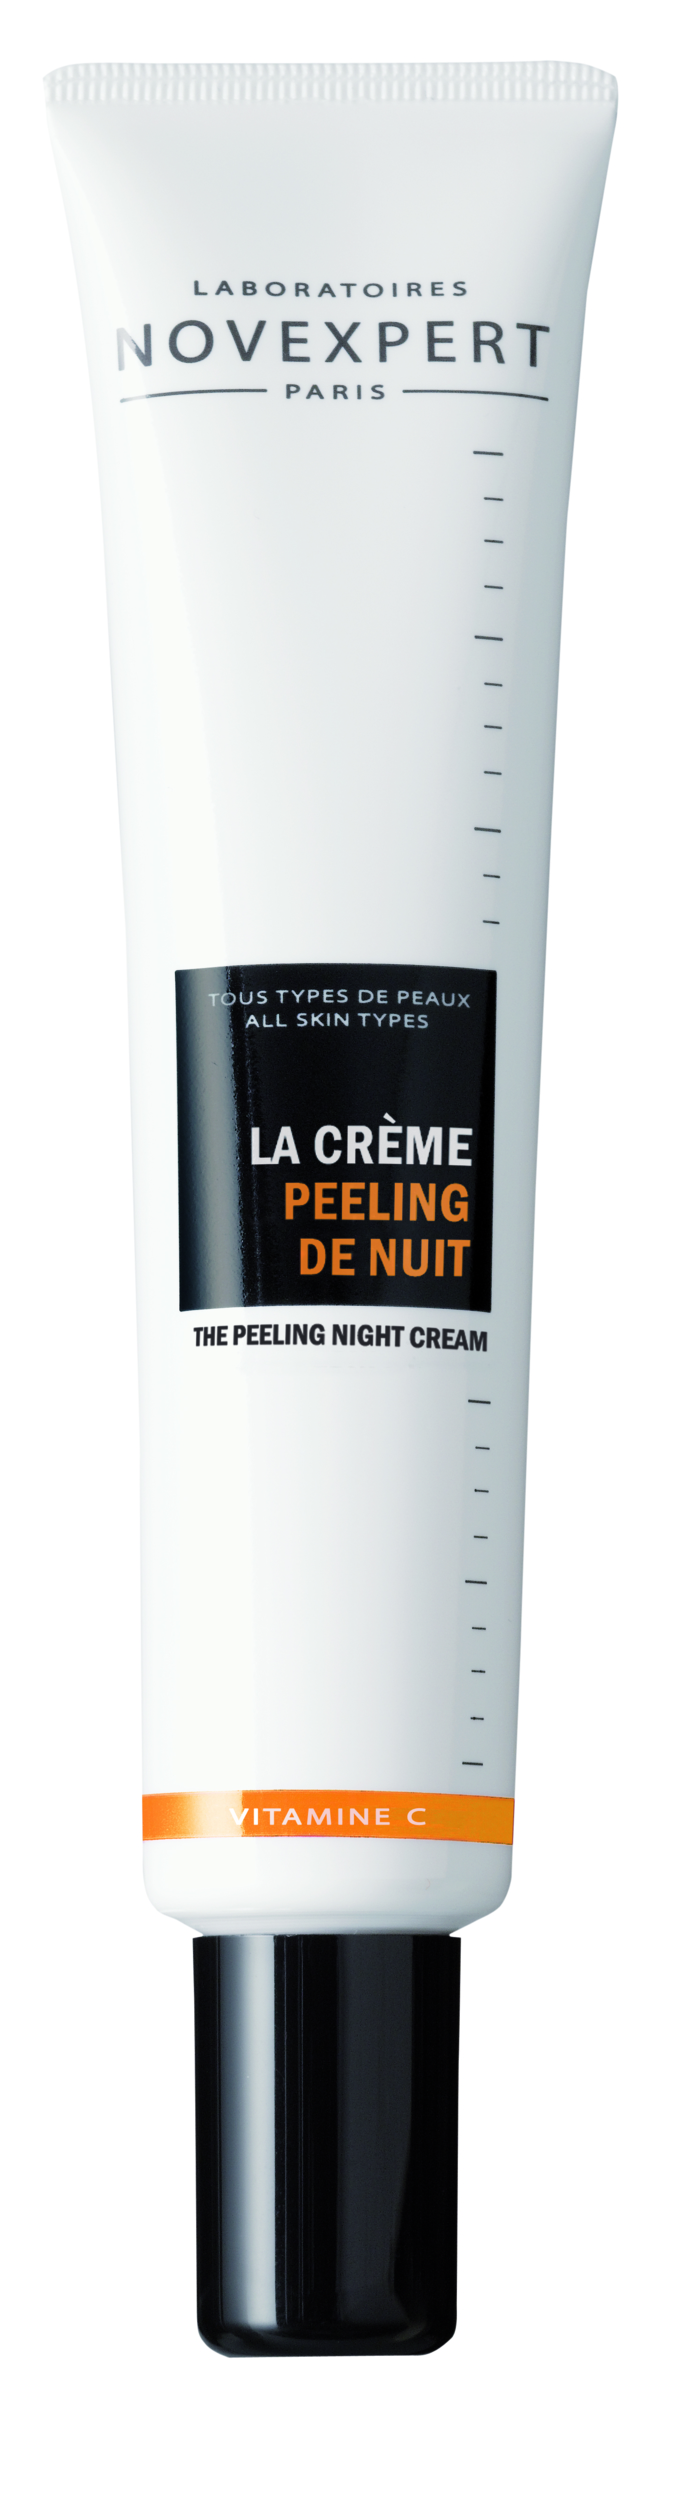 Novexpert - crème Peeling nuit